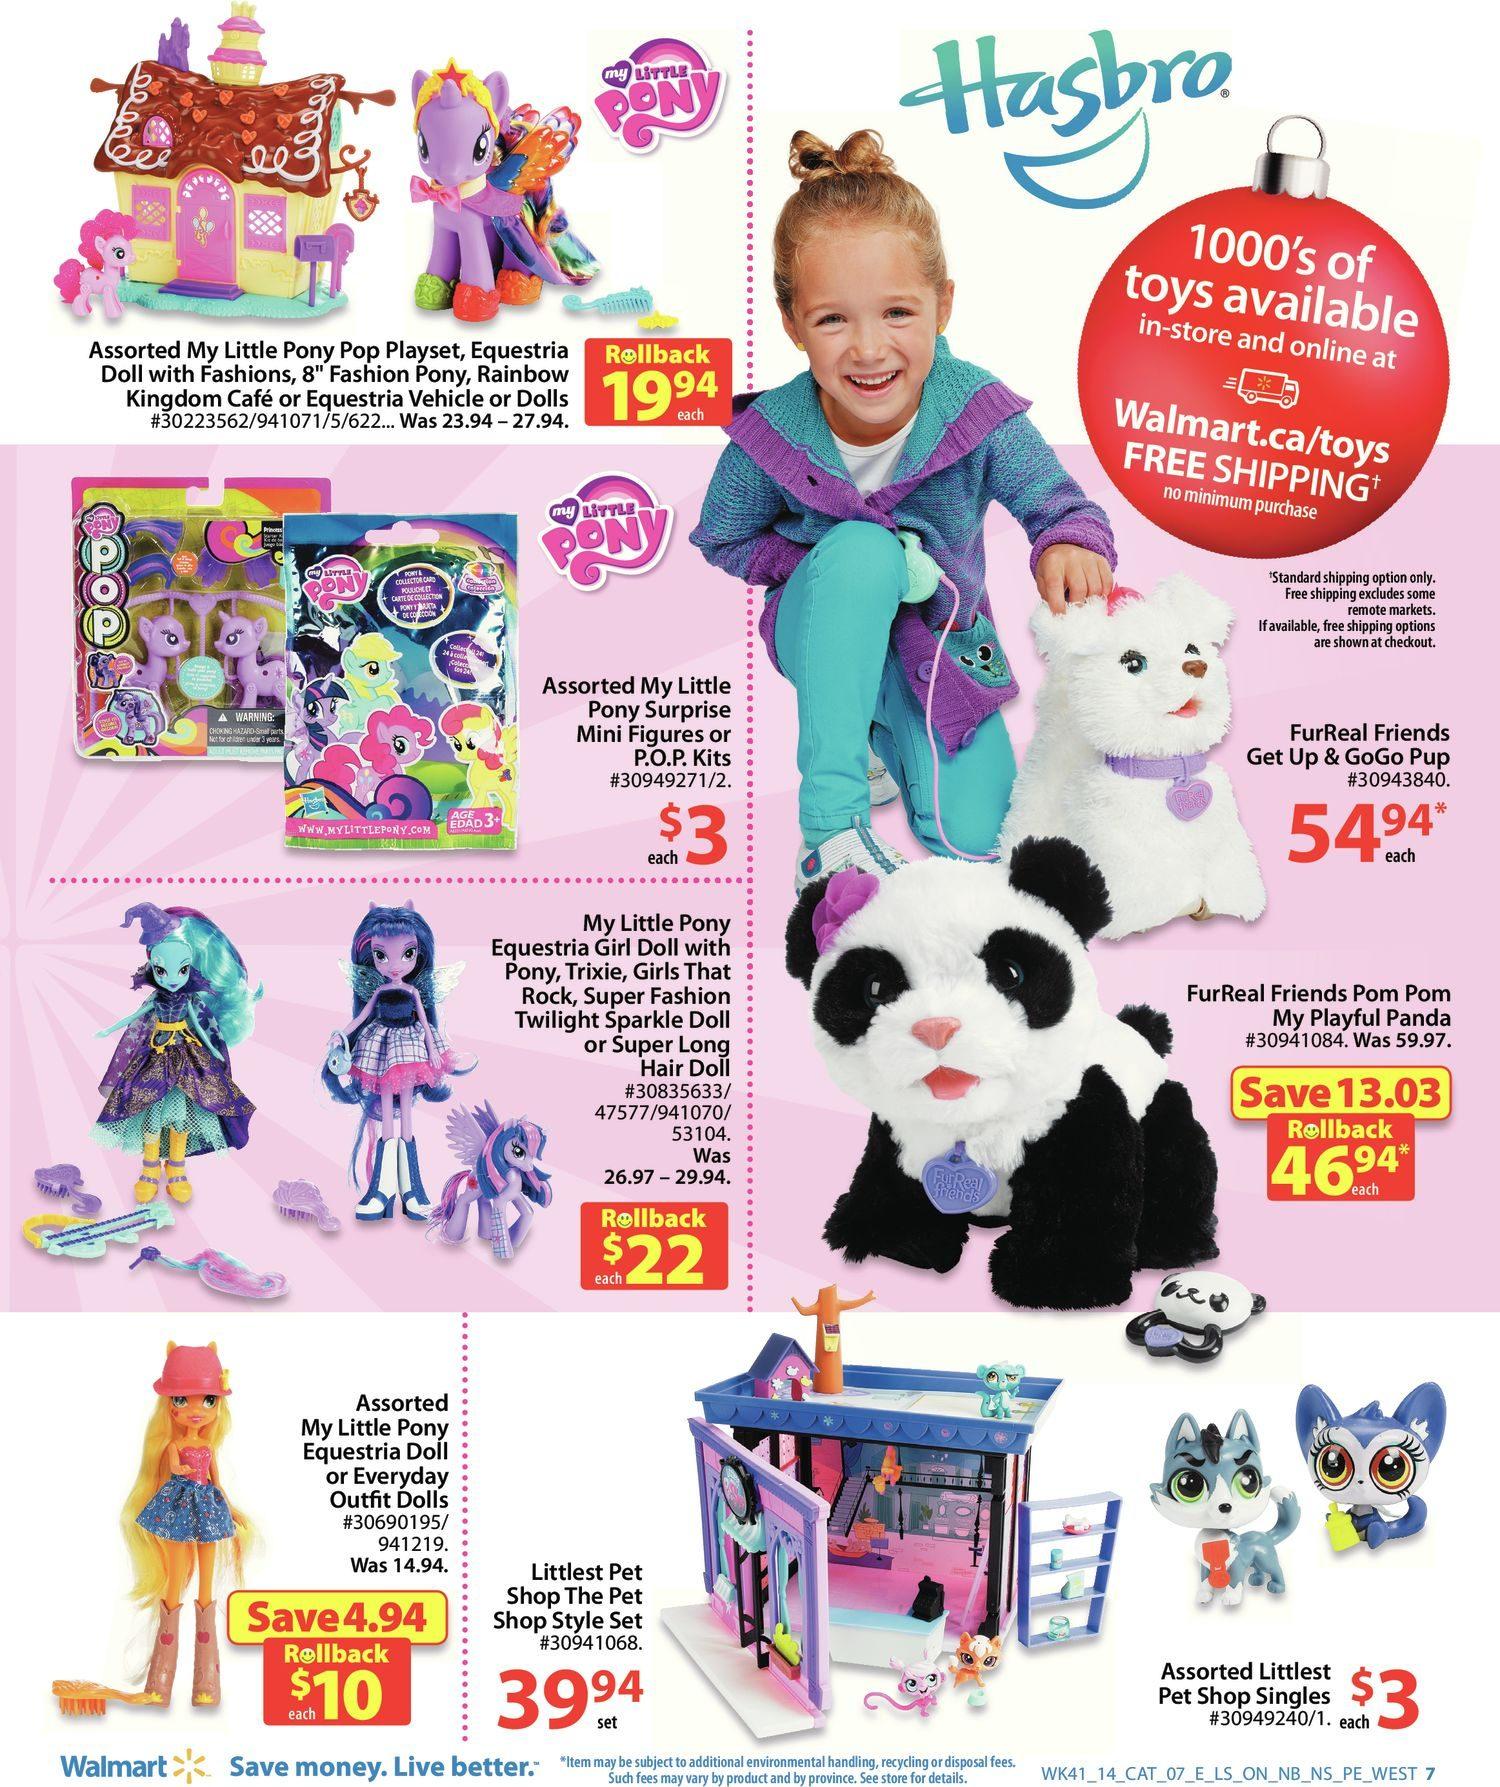 c388f342cfa Walmart Weekly Flyer - Holiday Play Book - Nov 6 – 19 - RedFlagDeals.com